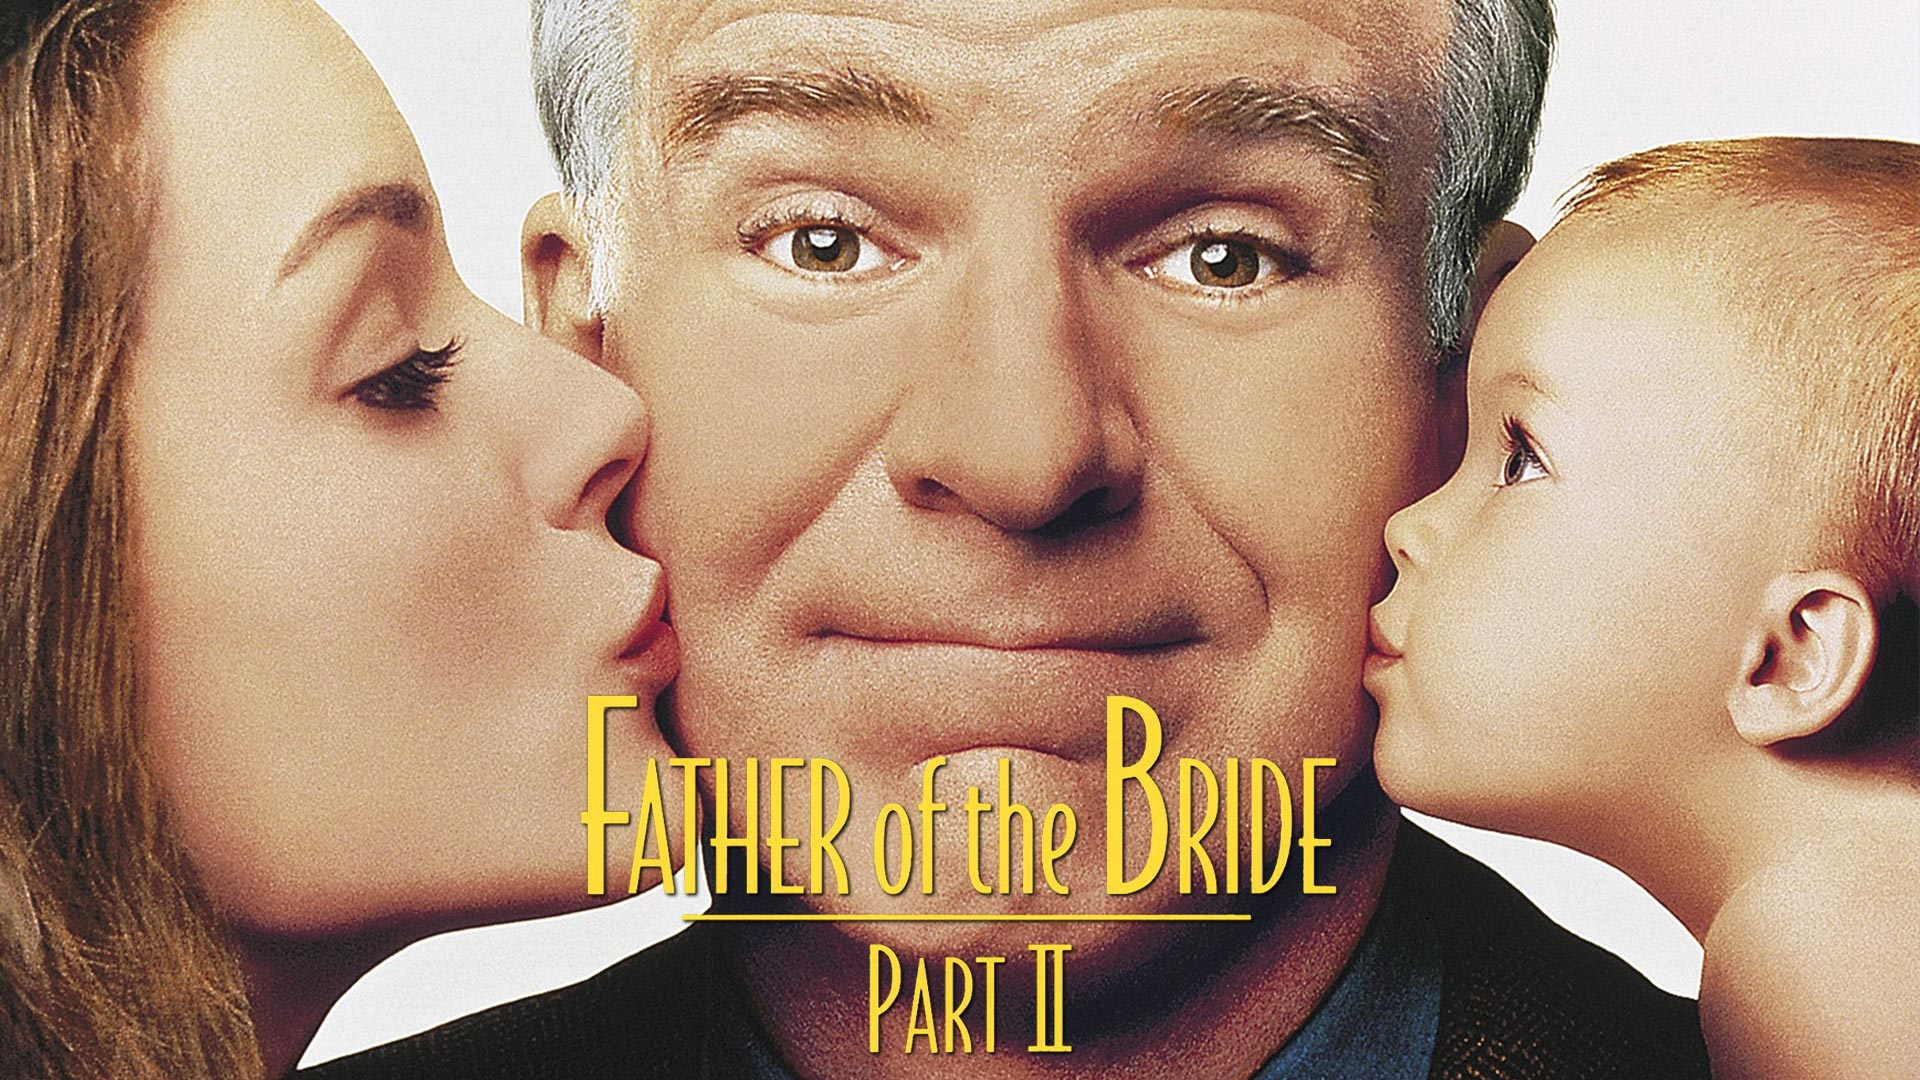 Father of the Bride Part II (Plus Bonus Features)